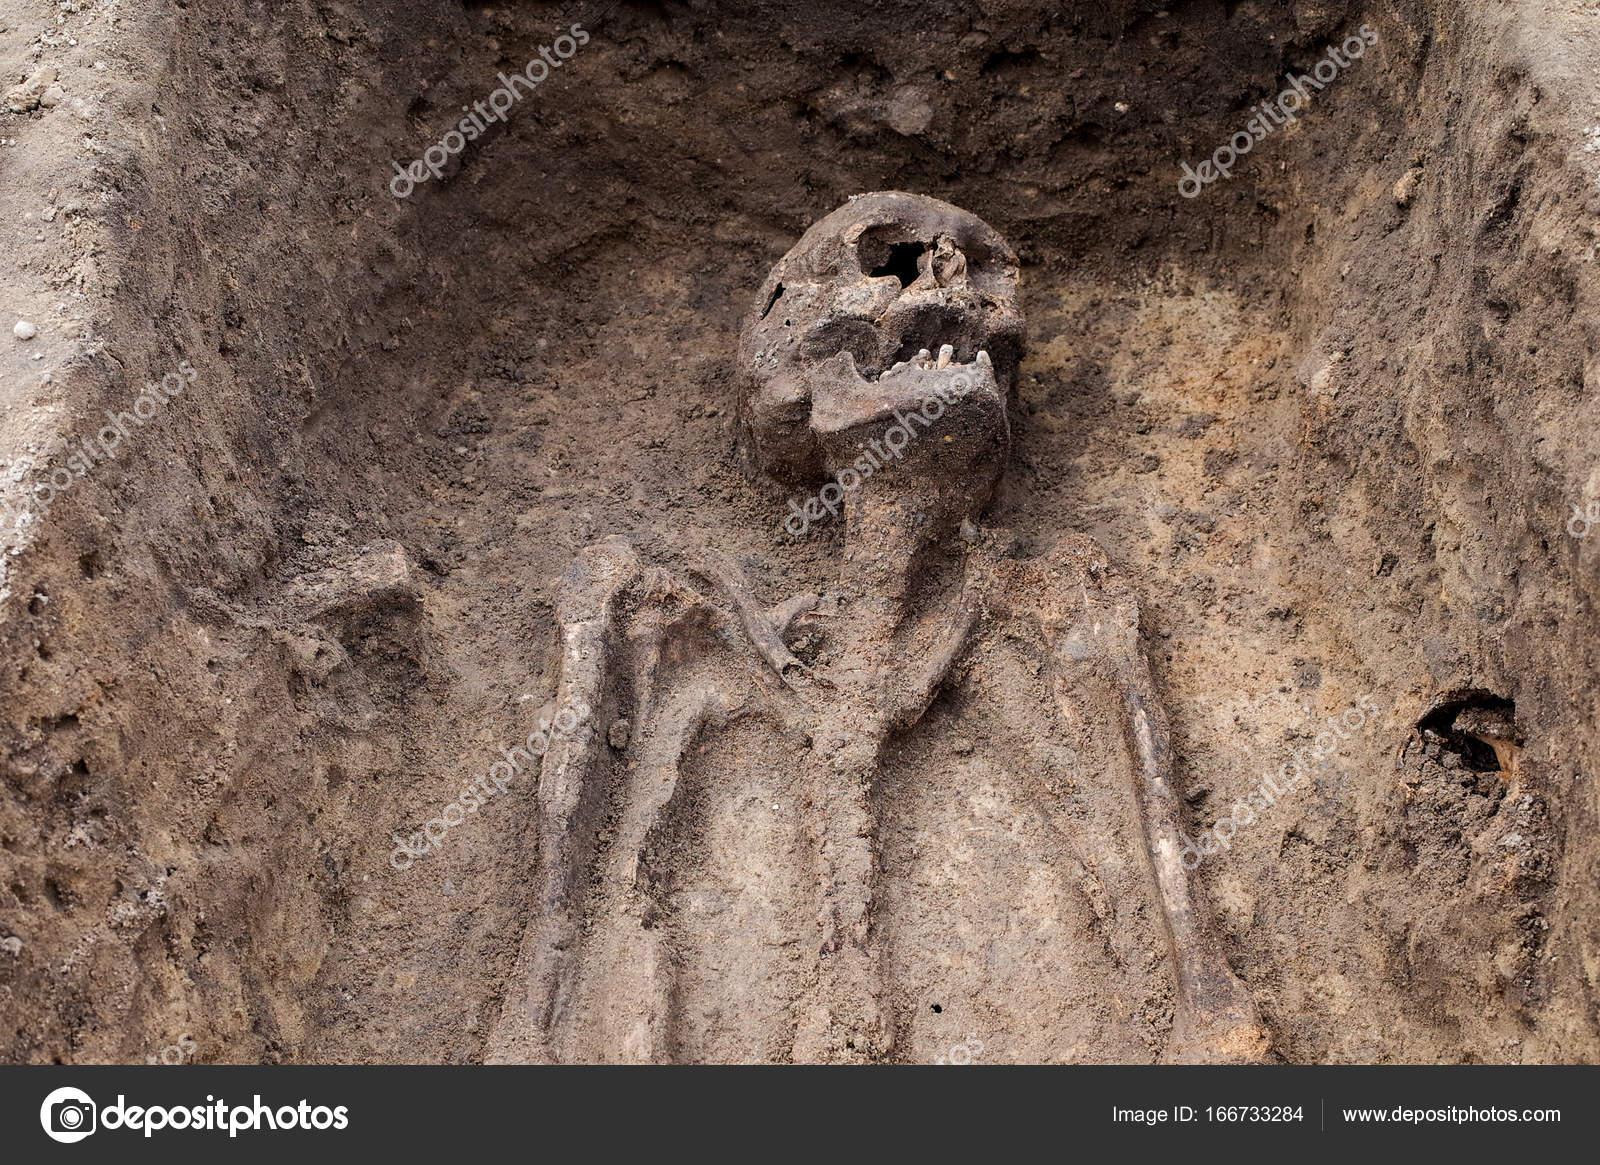 Depositphotos Stock Photo Archaeologist Excavating Ancient Burial